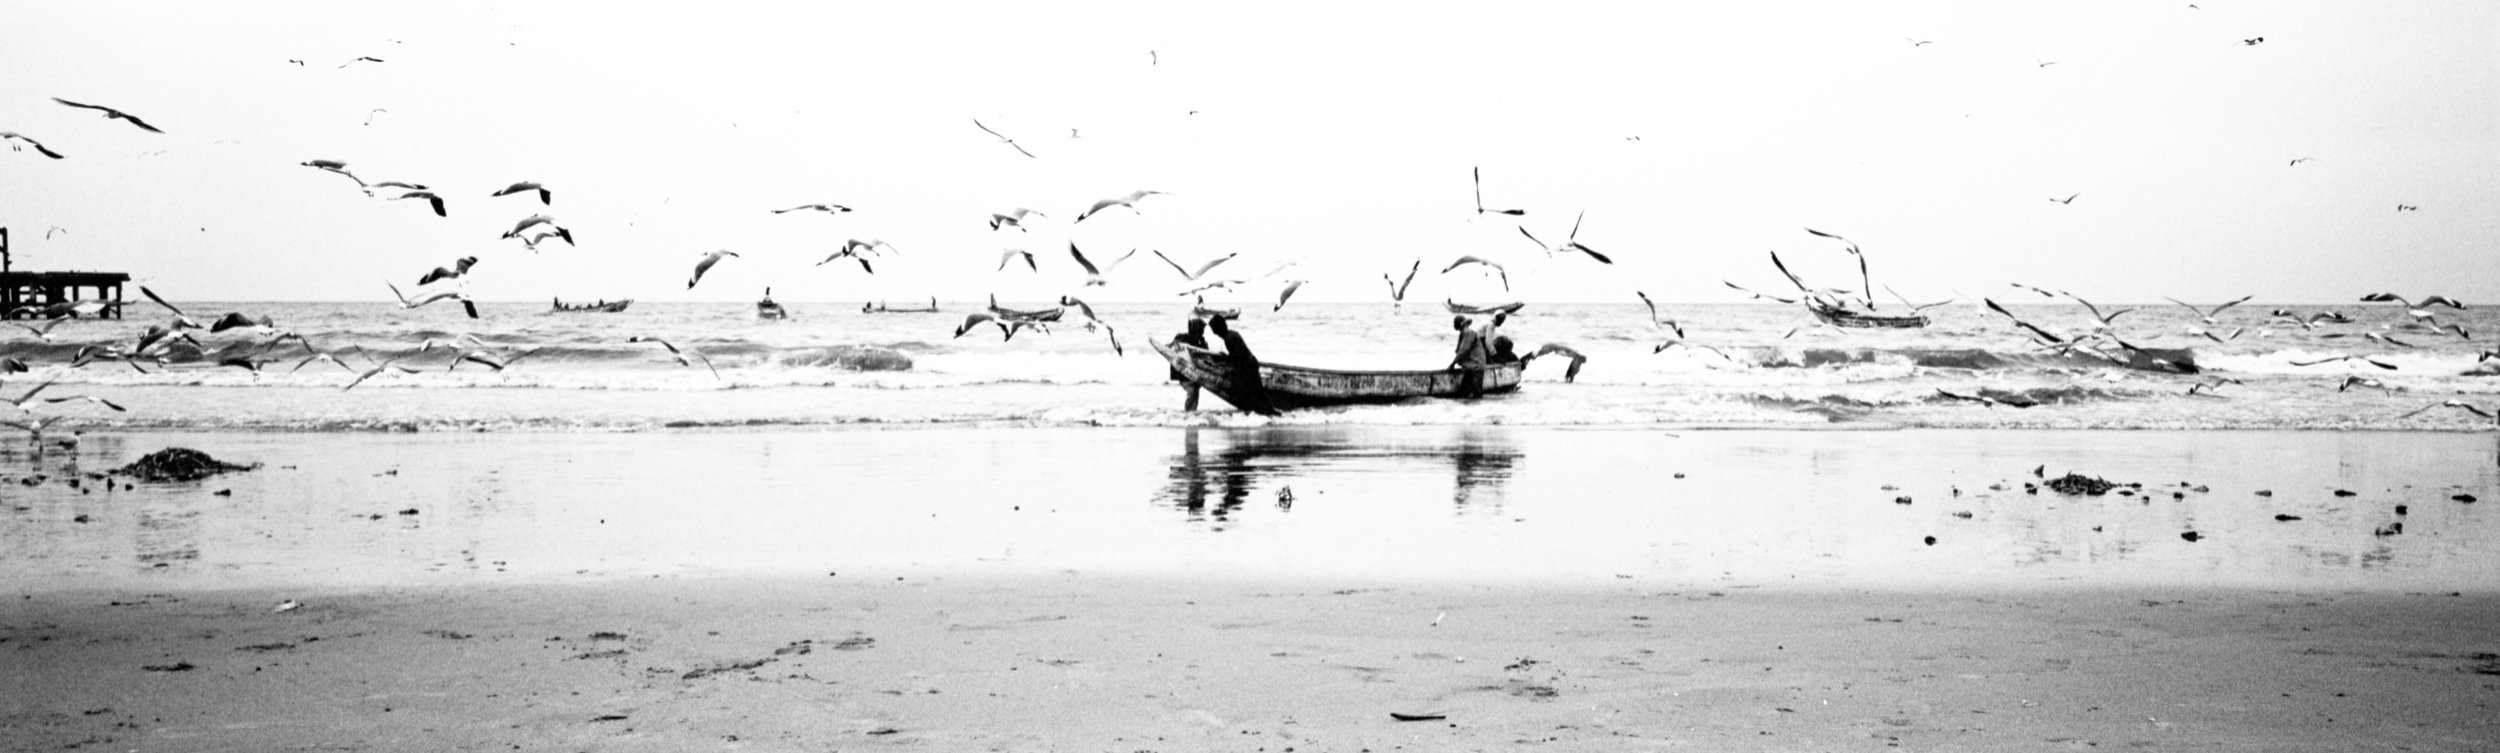 Landscape photography-10.jpg